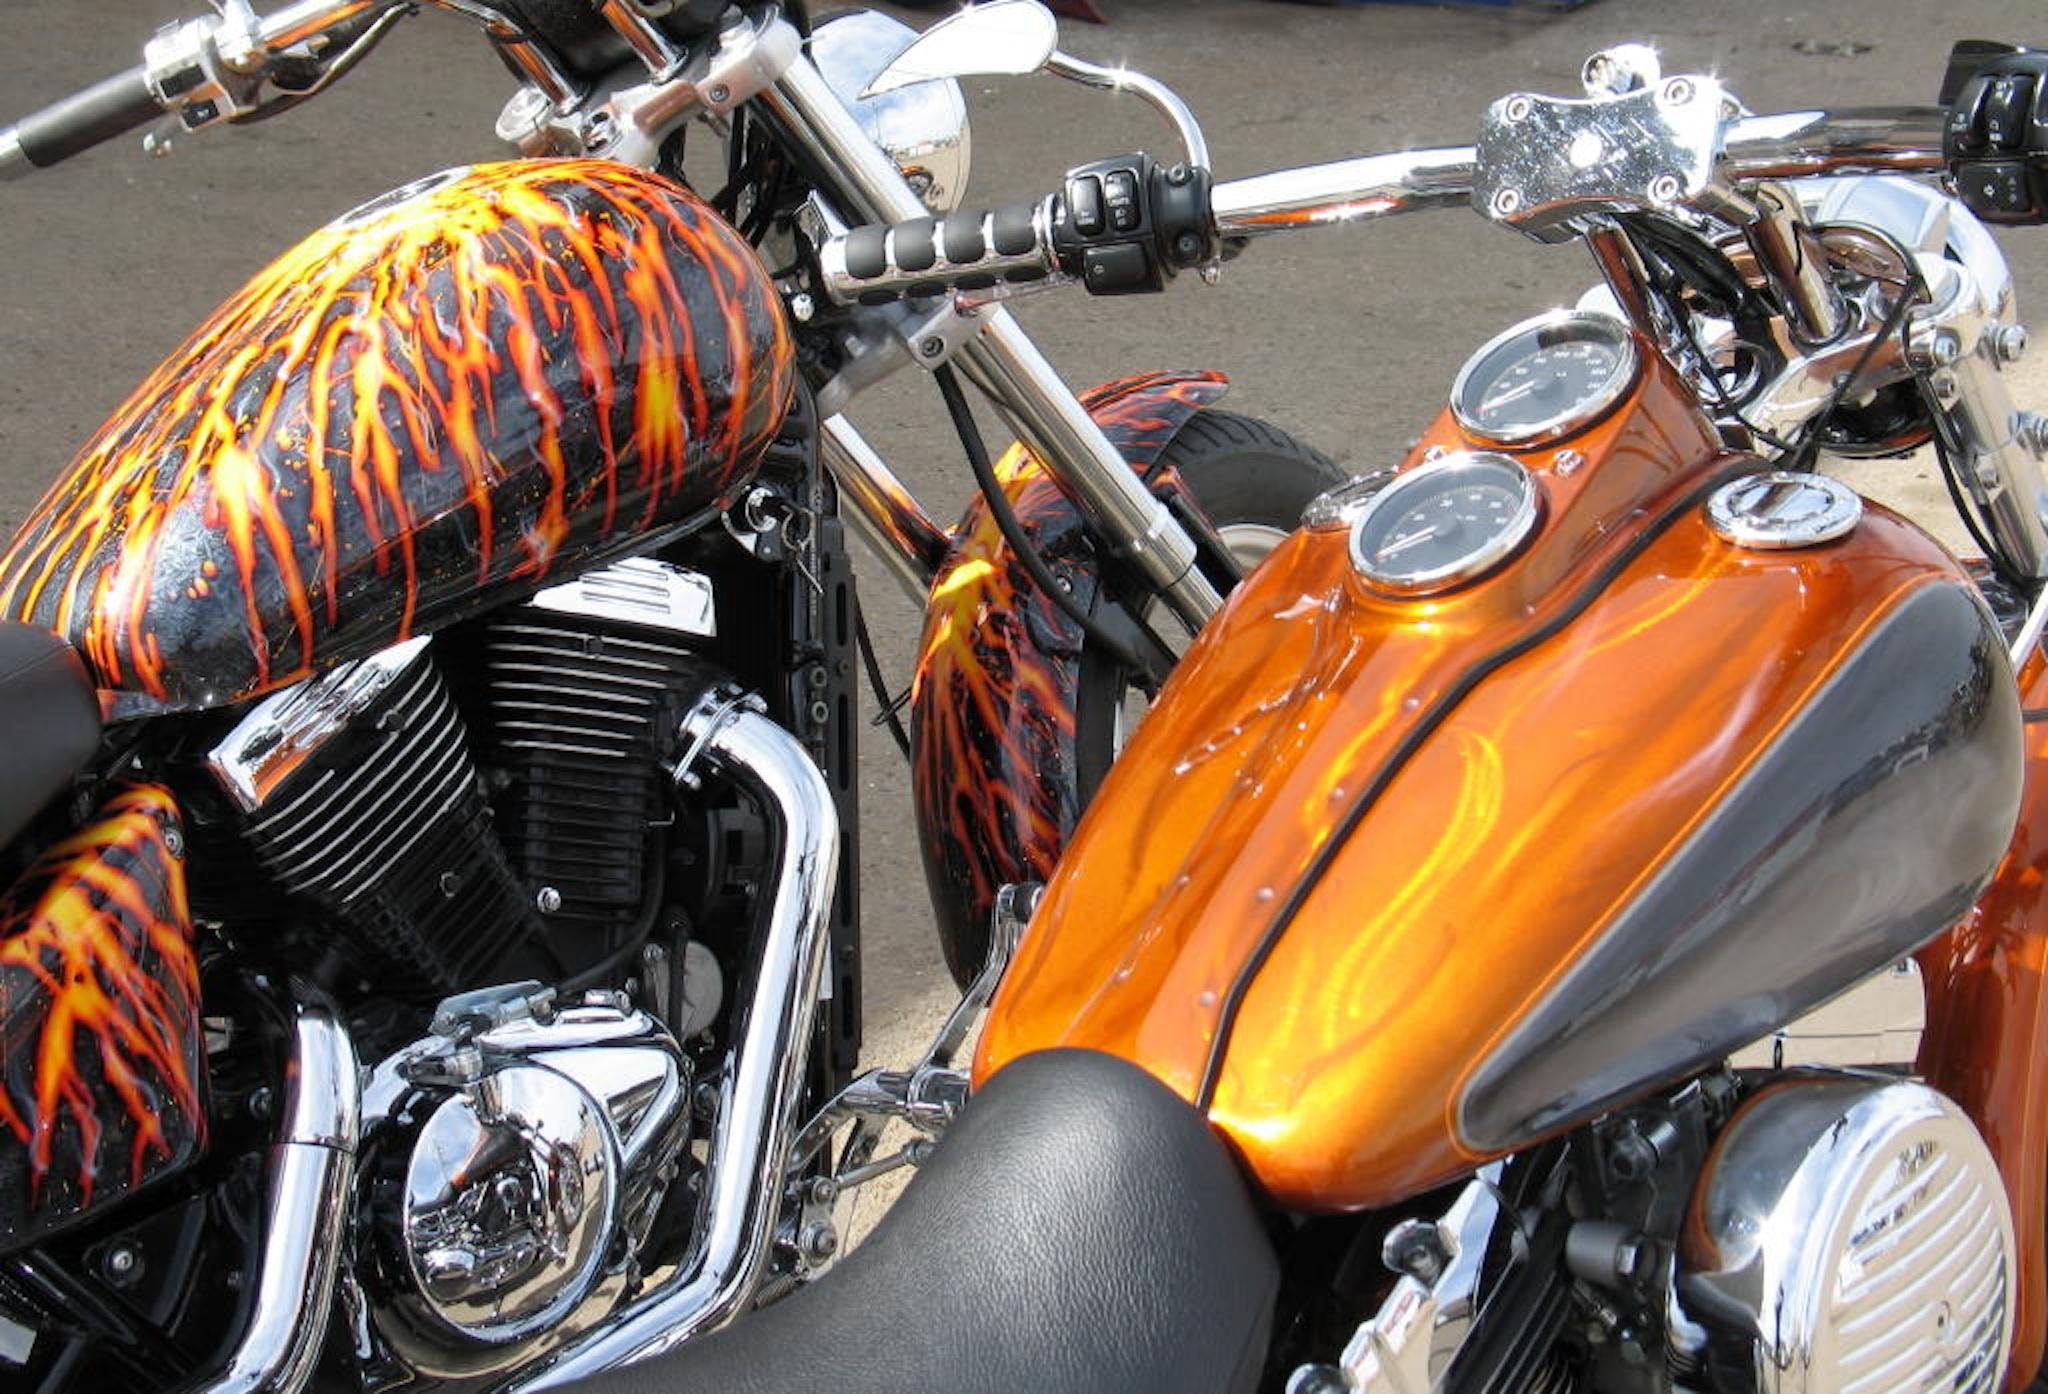 lava-bare-orange-bikes